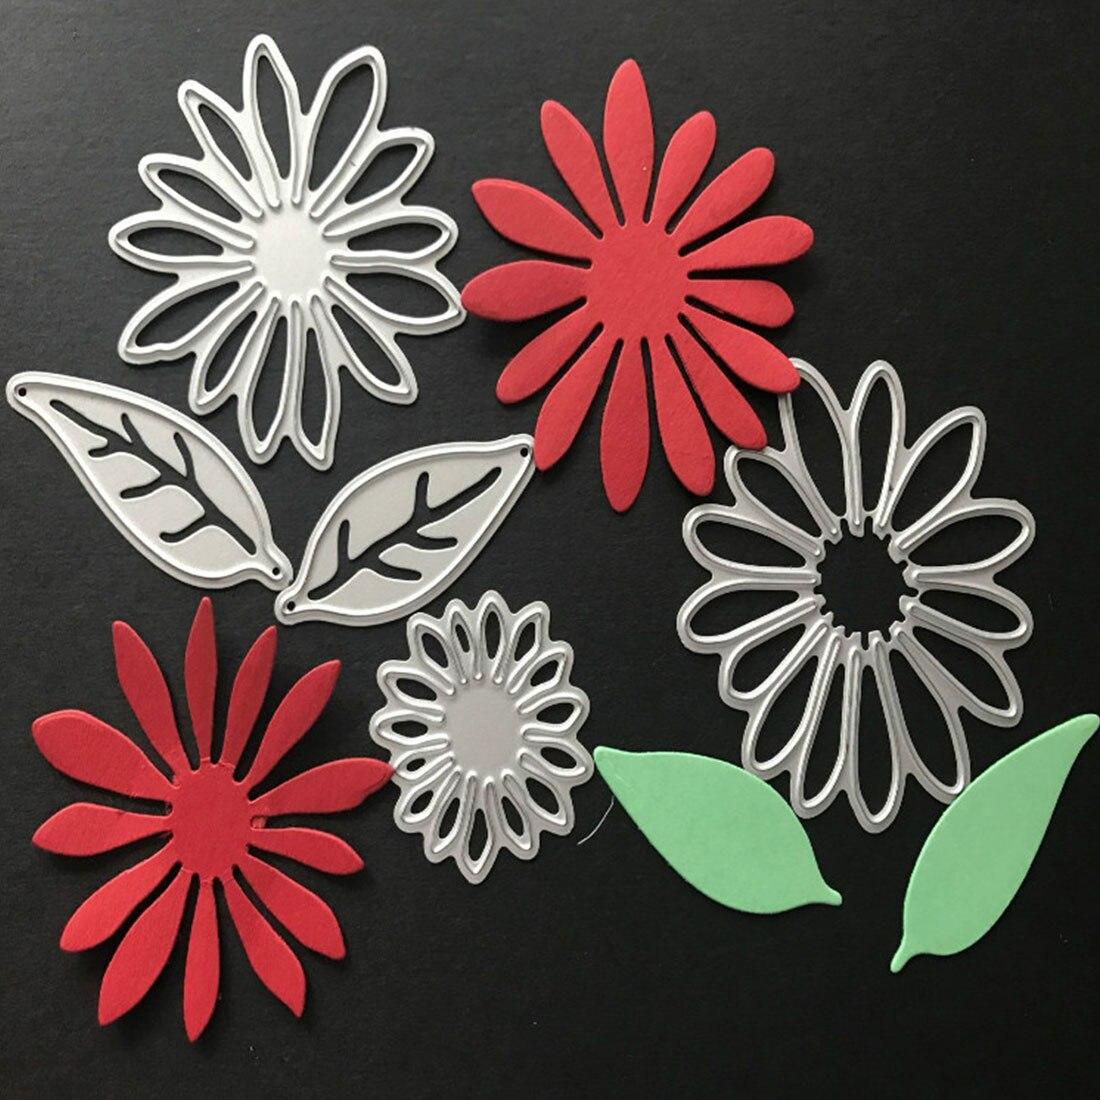 6Pcs Leaves Flowers Metal Cutting Dies For DIY Scrapbooking Album Paper Cards  R